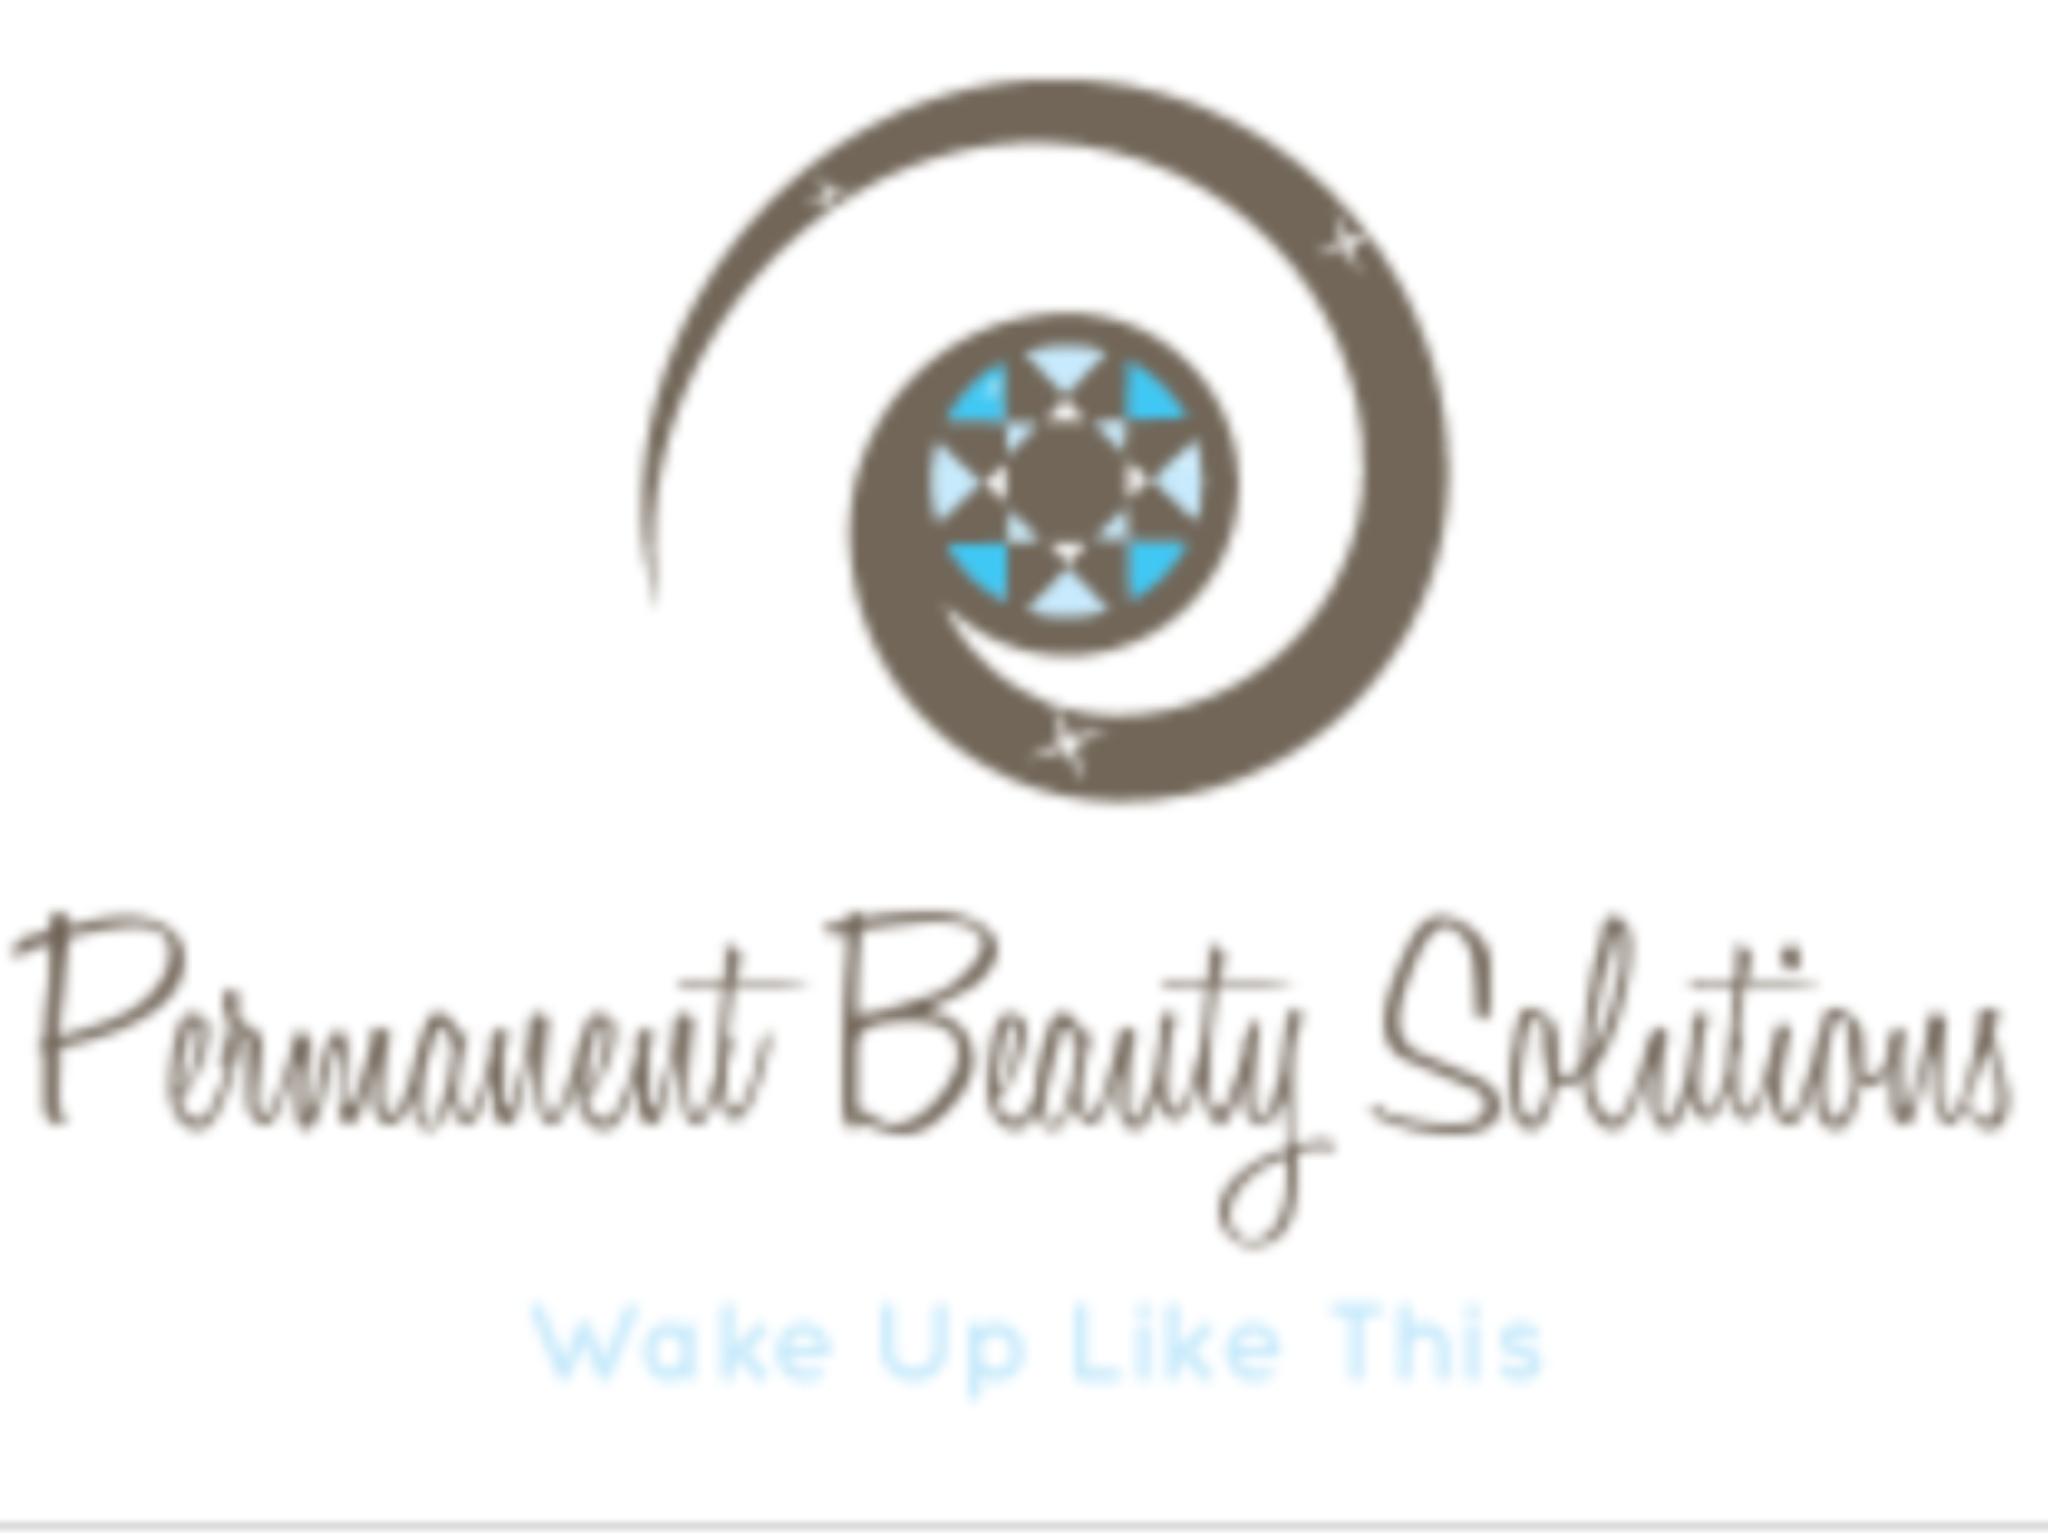 Permanent Beauty SolutionsEaston, PA Permanent Makeup